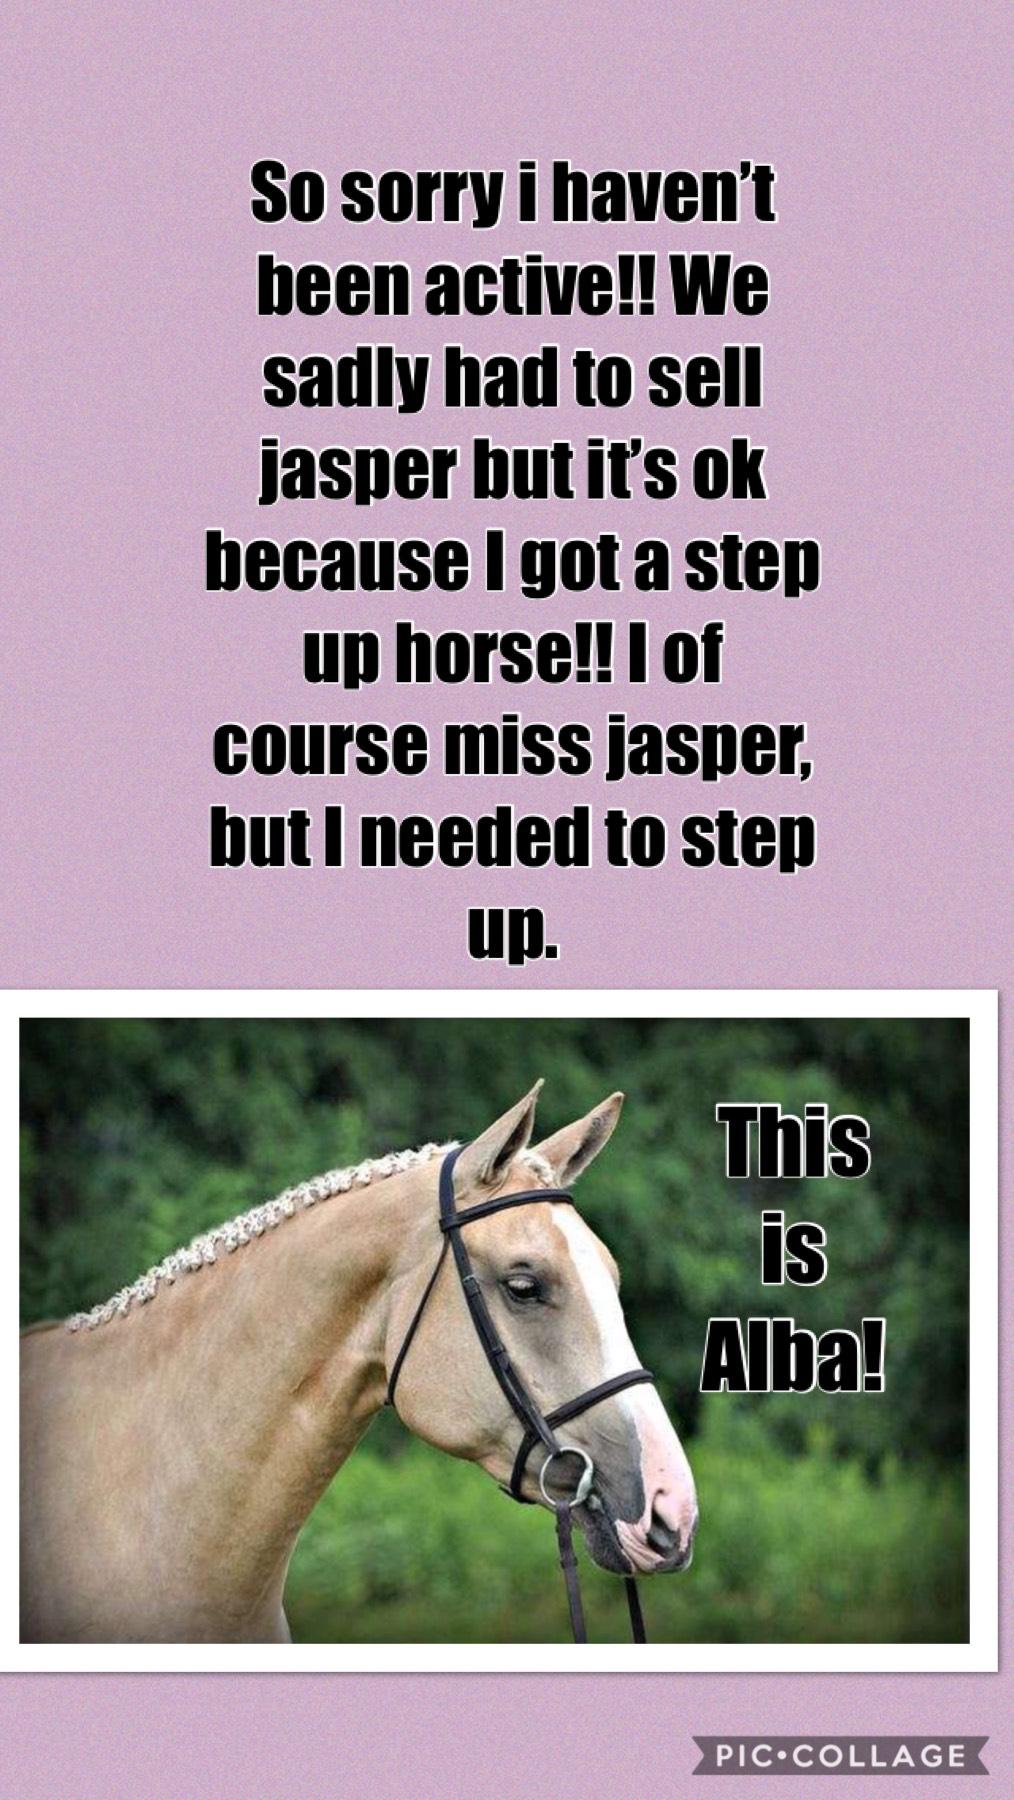 I'm so happy! I miss jasper tho!😢❤️❤️